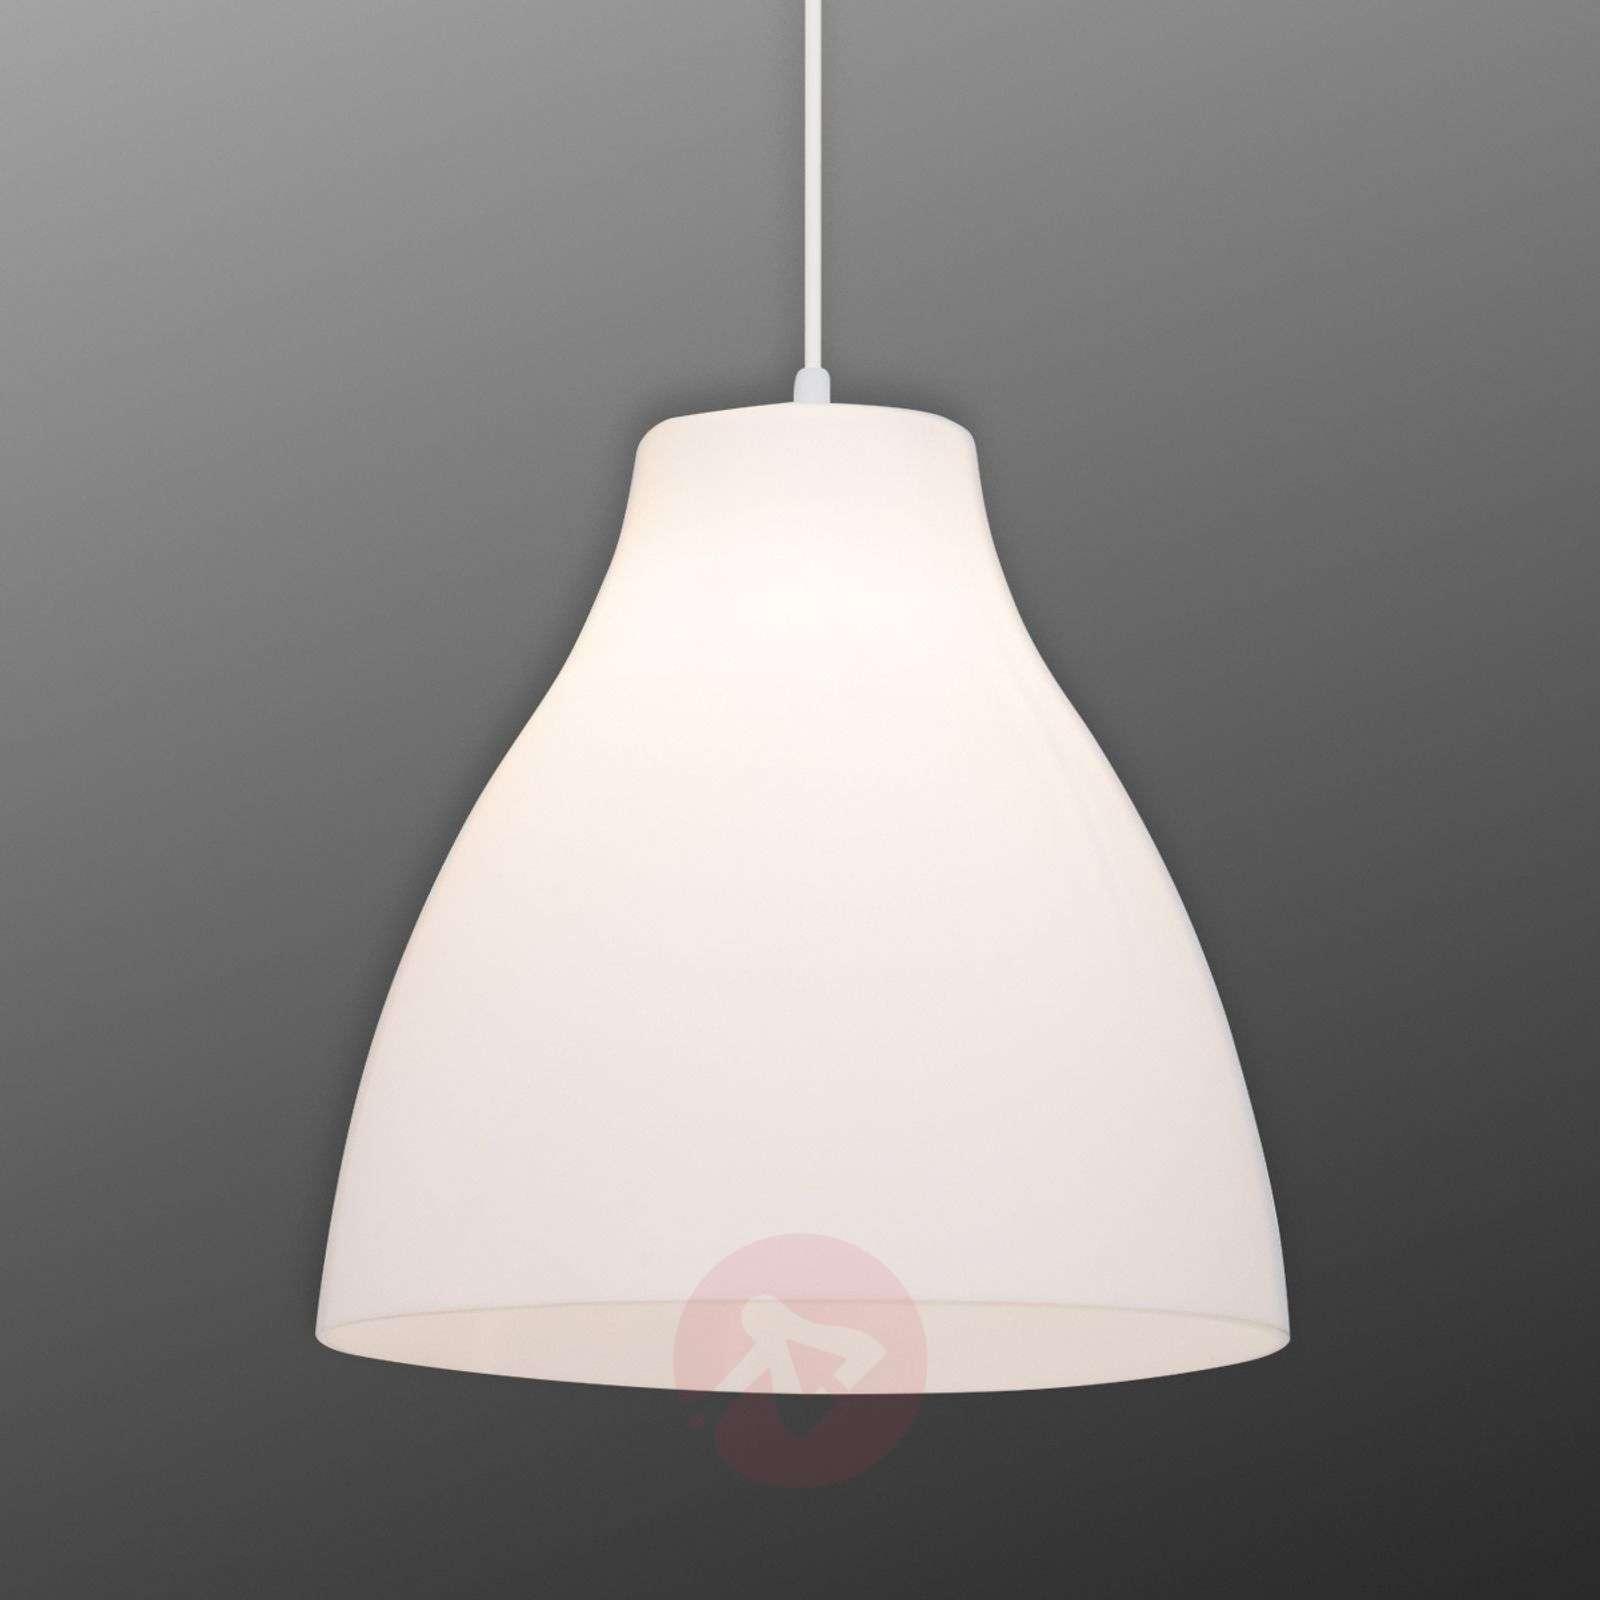 Bizen a hanging light all in white-1508993-01